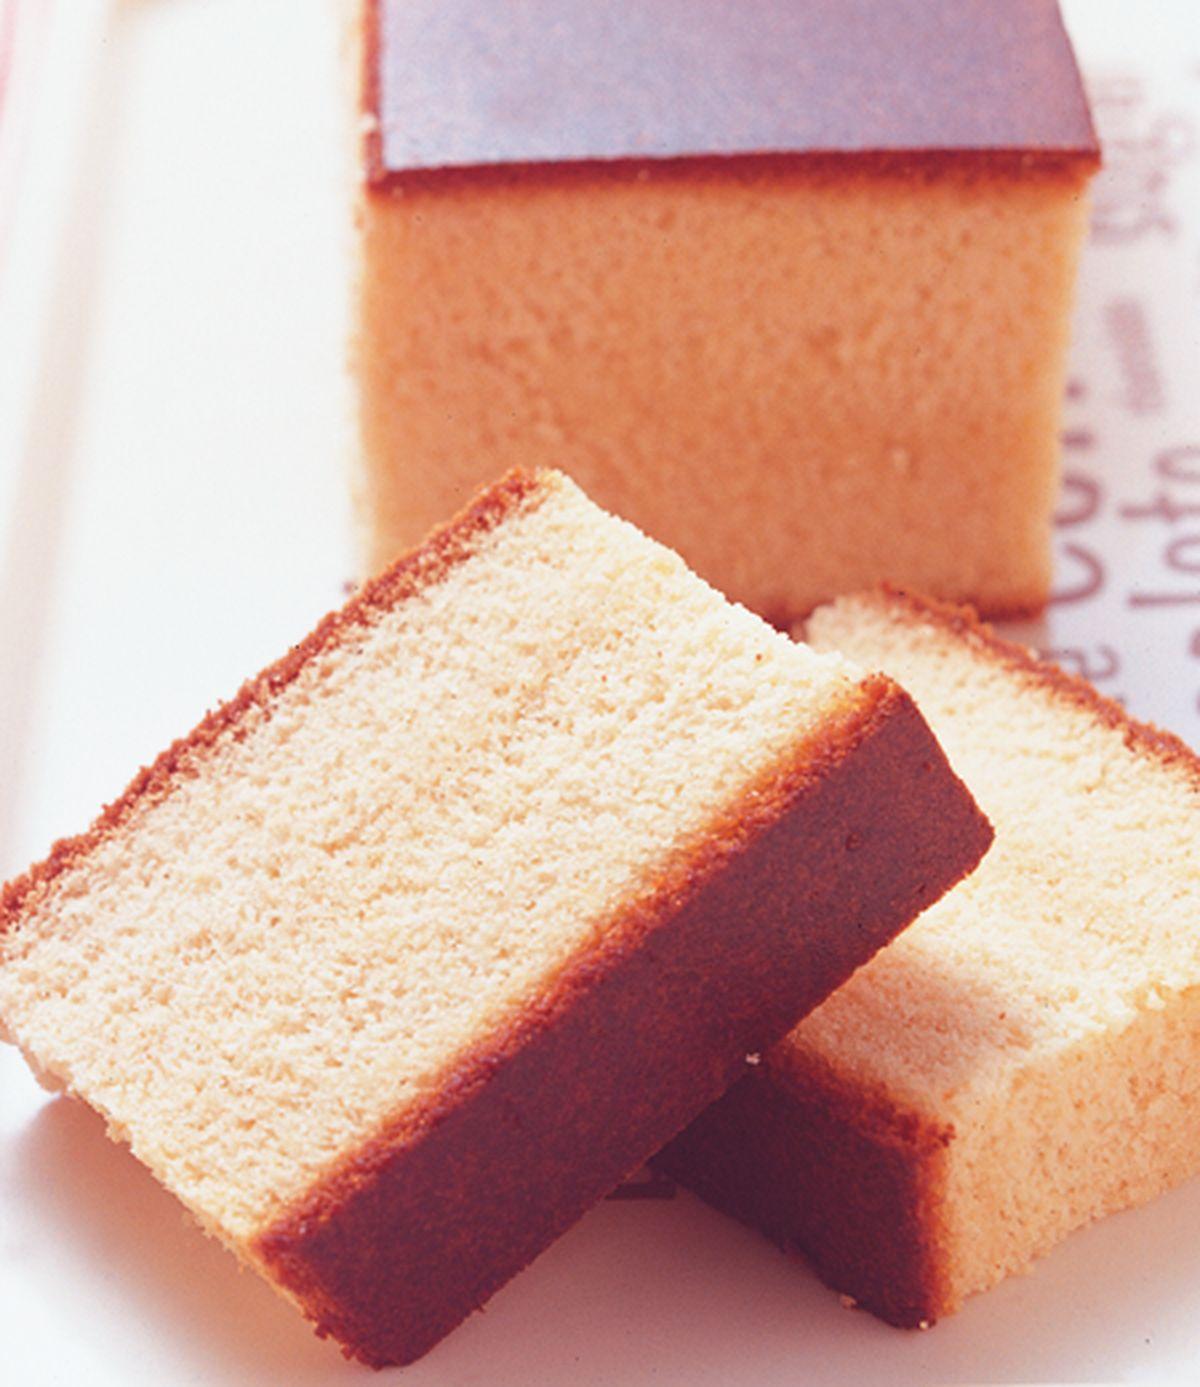 【食譜】咖啡蜂蜜蛋糕:www.ytower.com.tw